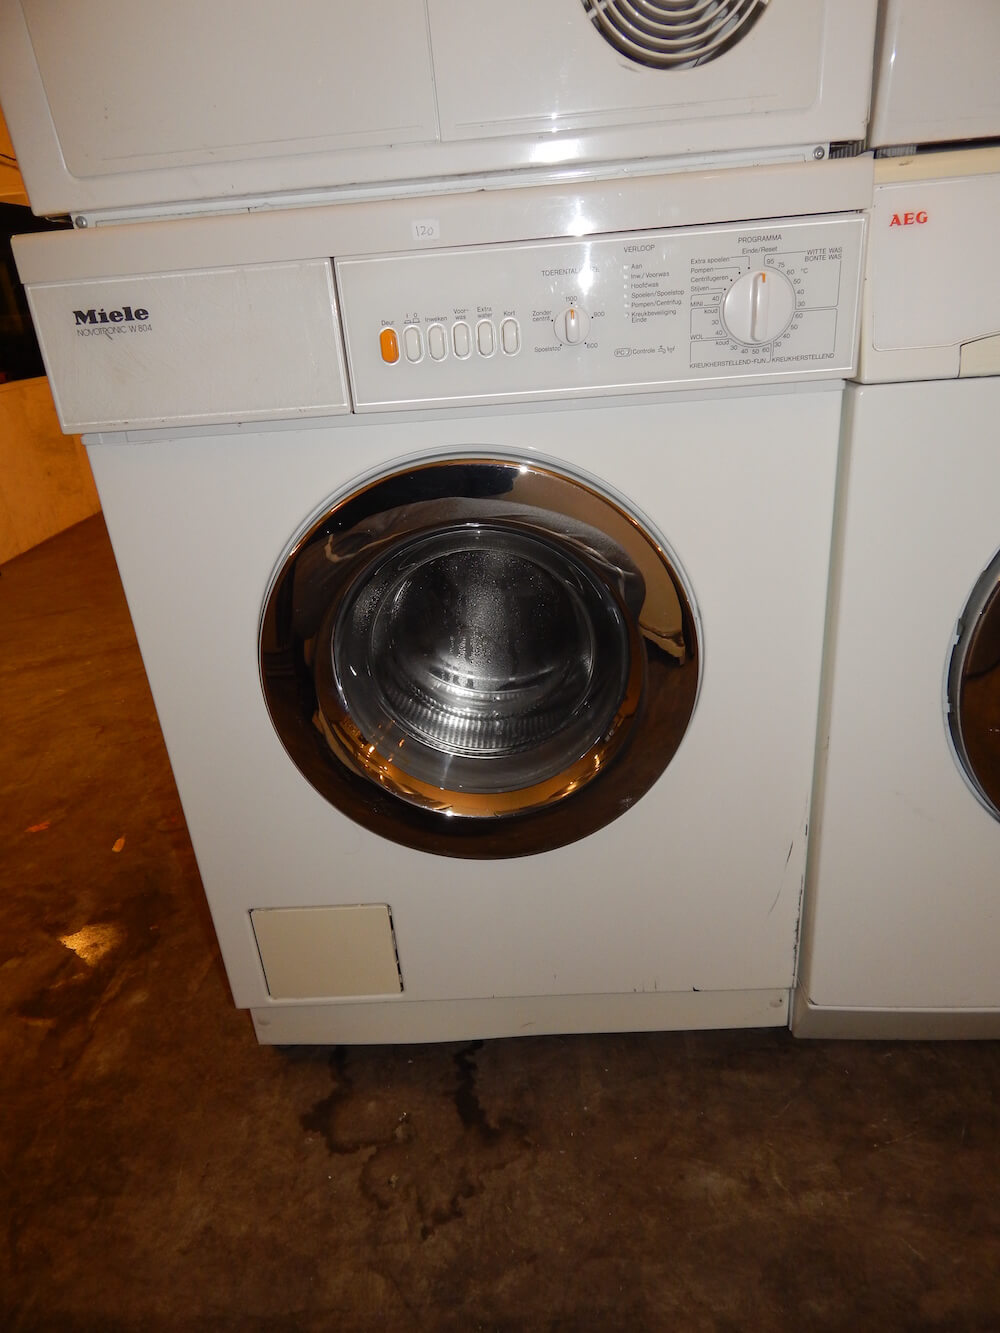 Miele wasmachine aanbieding